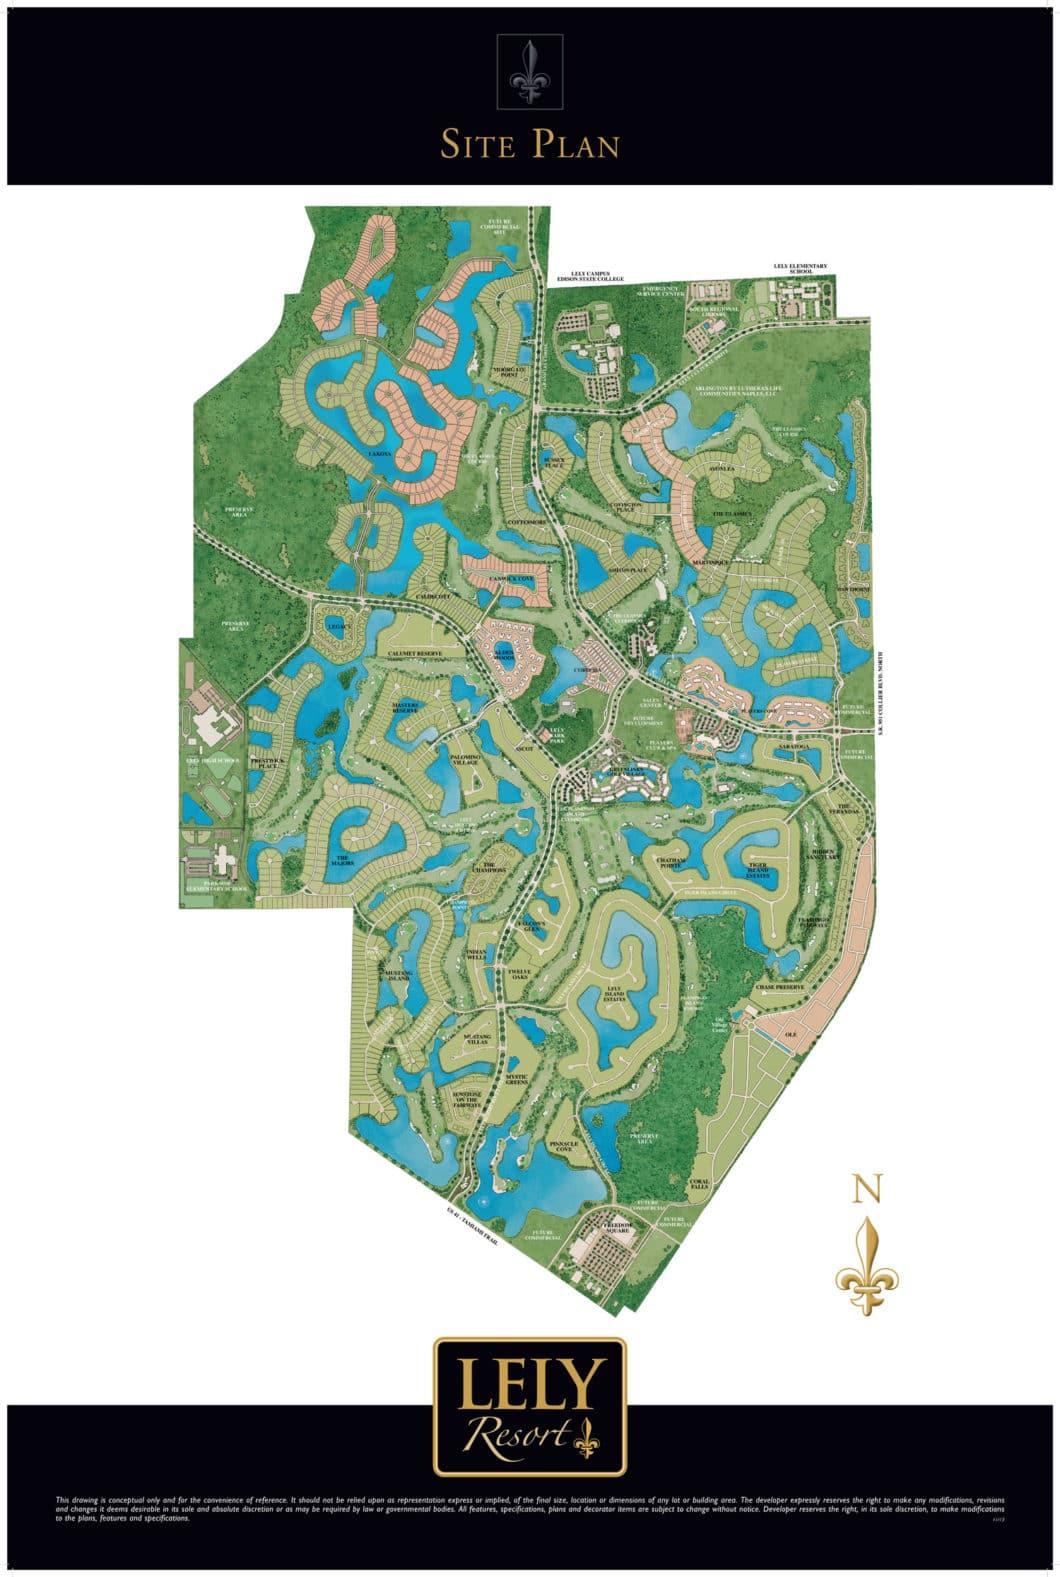 Lely Resort Neighborhoods | Find Your Dream Home In Lely Resort - Lely Resort Naples Florida Map